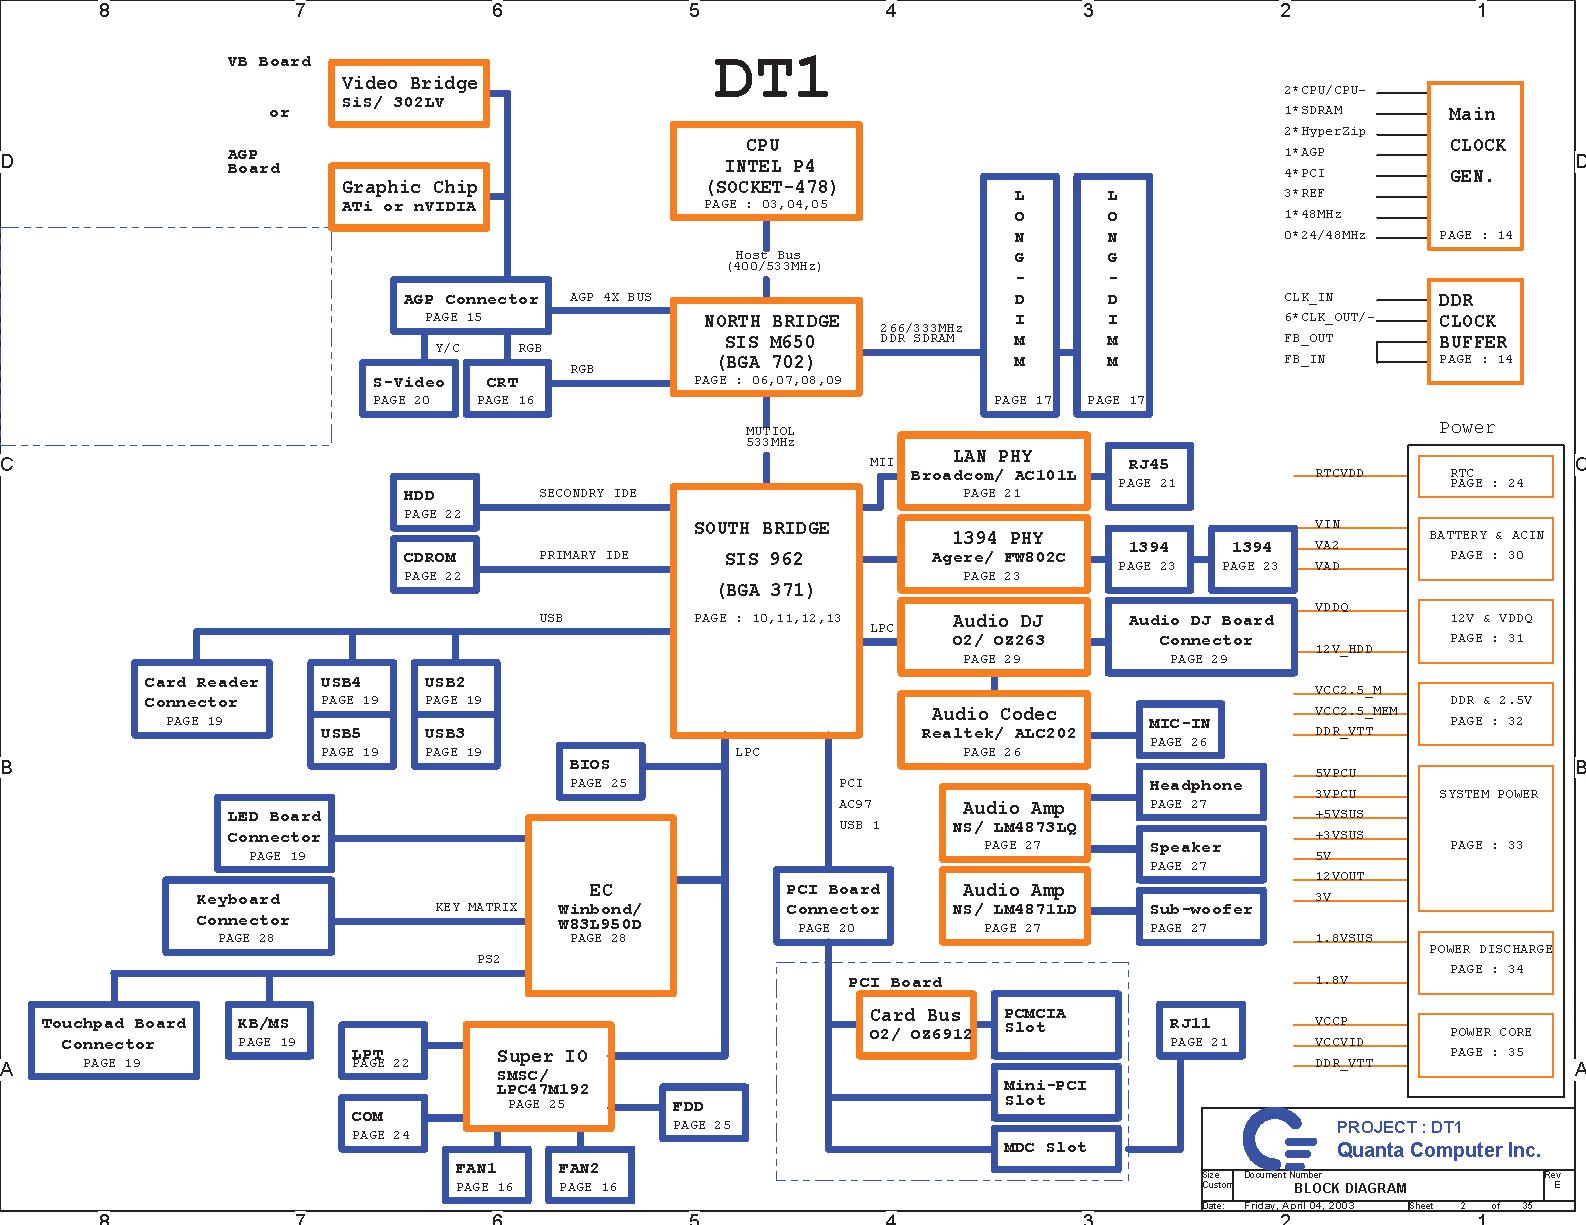 intel motherboard circuit diagram pdf 2003 ford expedition vacuum free wiring for you p4 cpu socket 478 schematic rh datasheetgadget wordpress com 945